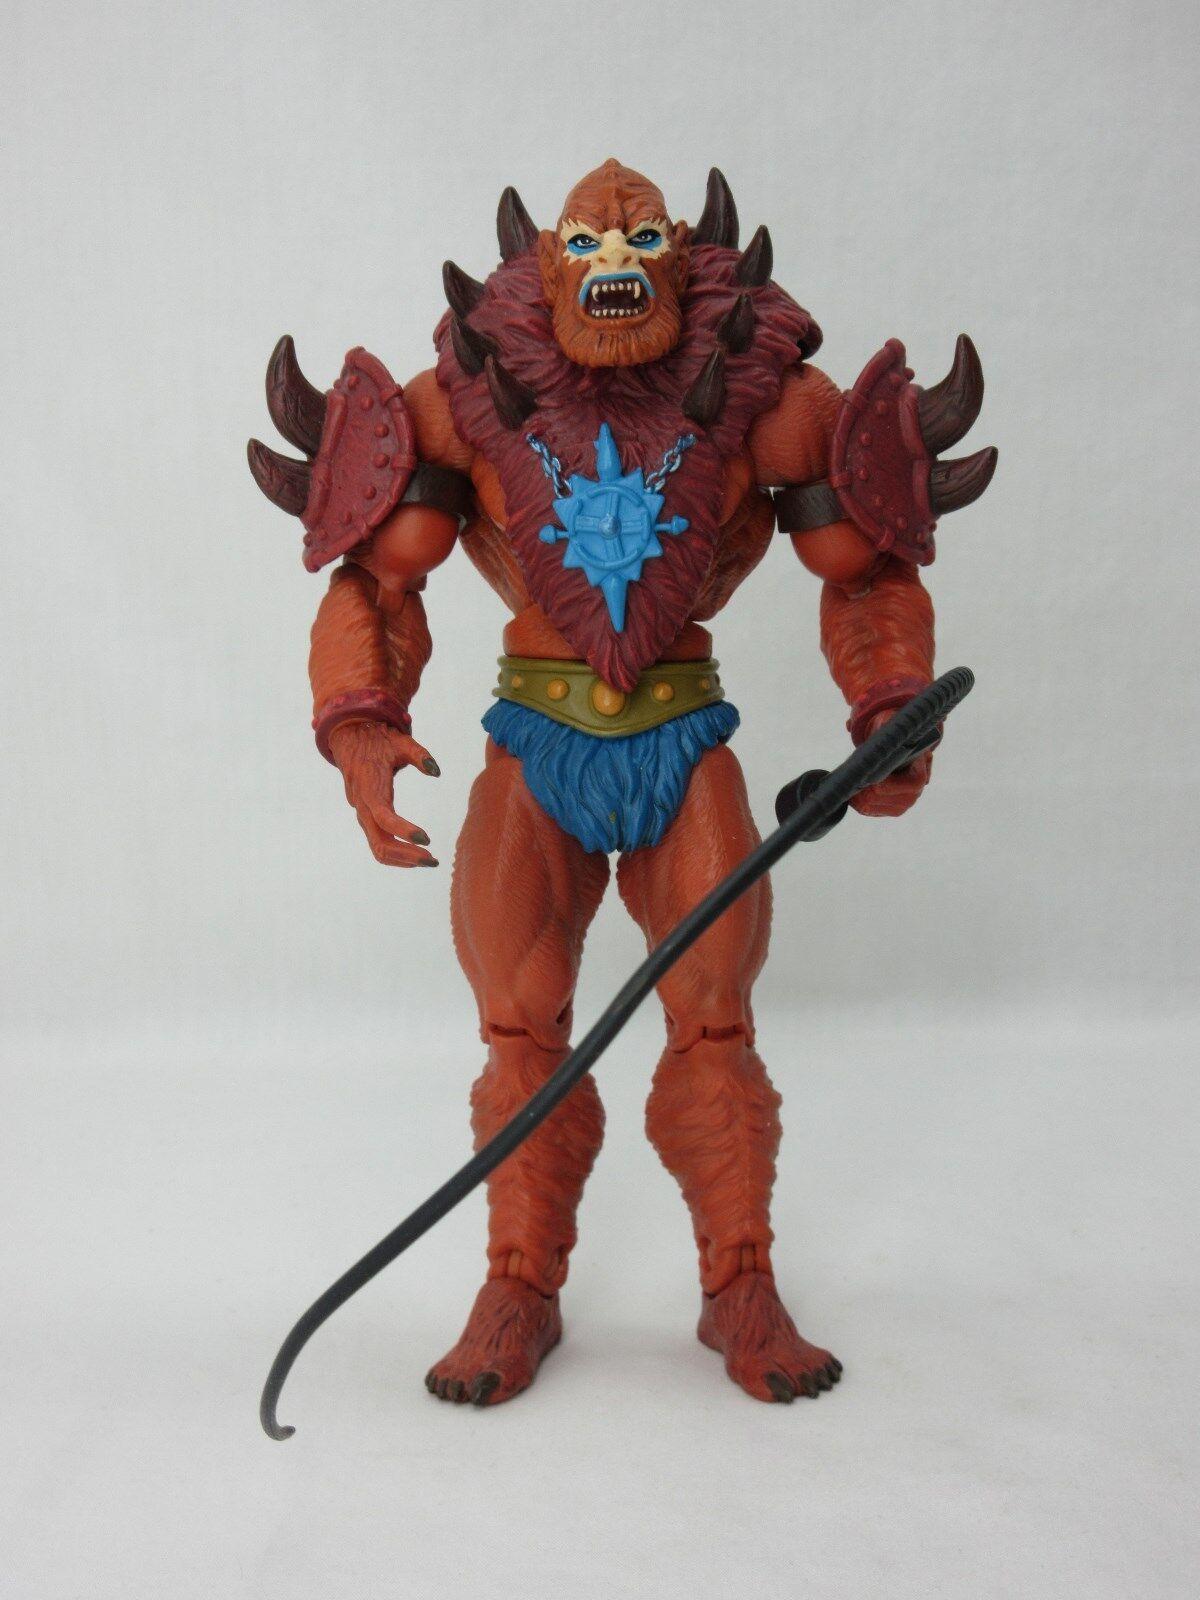 MOTUC,MOTU,BEAST MAN,Masters Of The Universe Classics,100% Complete,He man